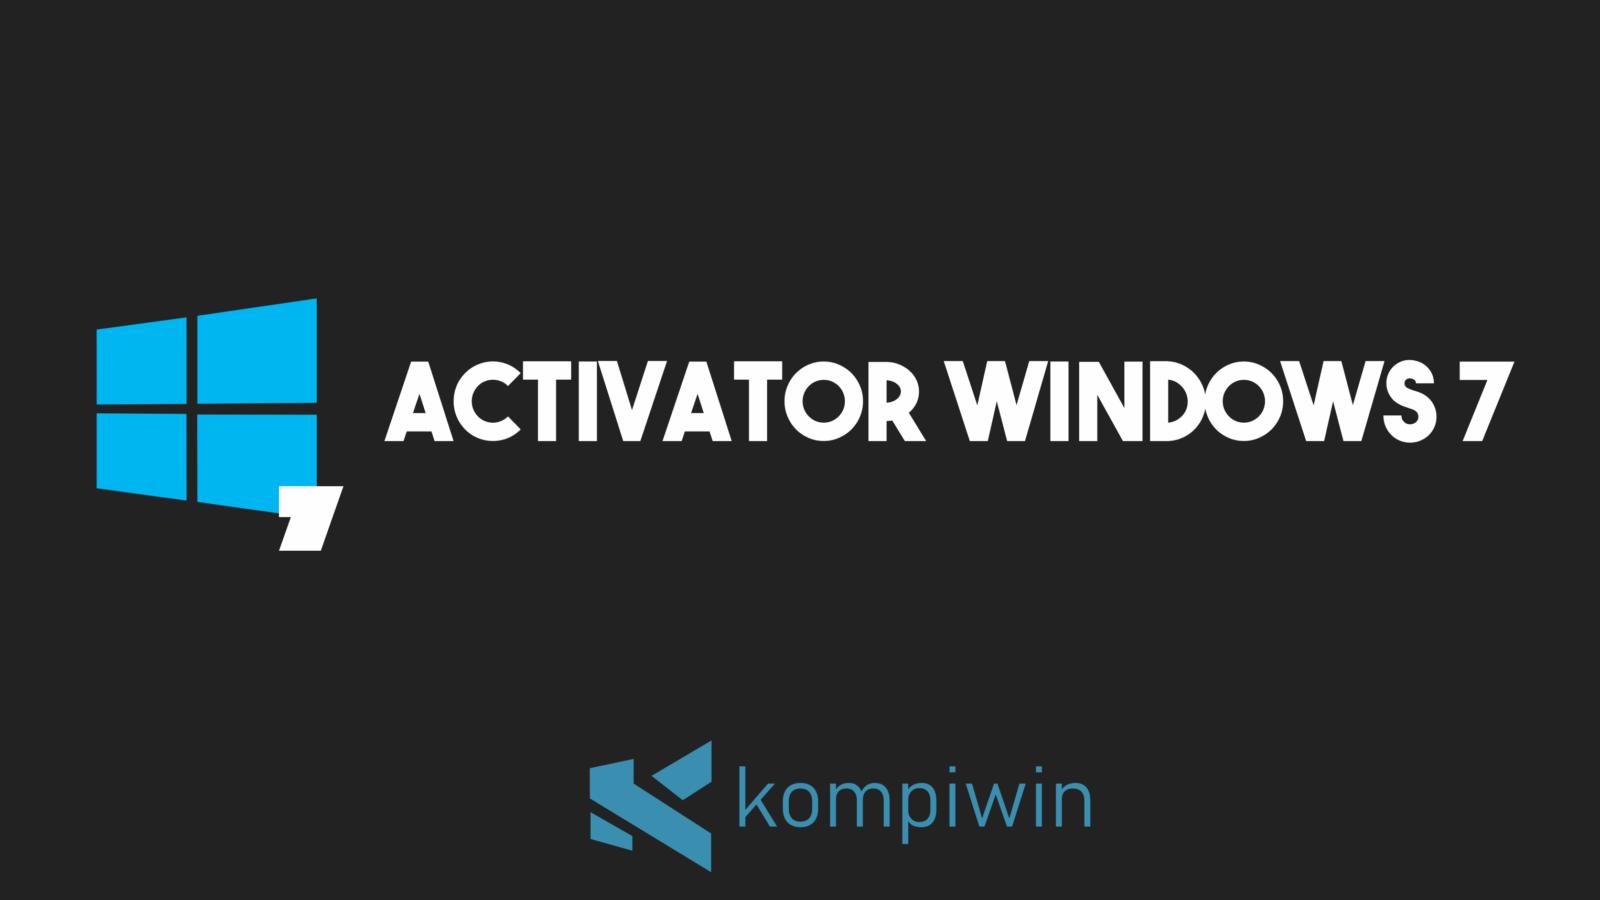 Activator Windows 7 4